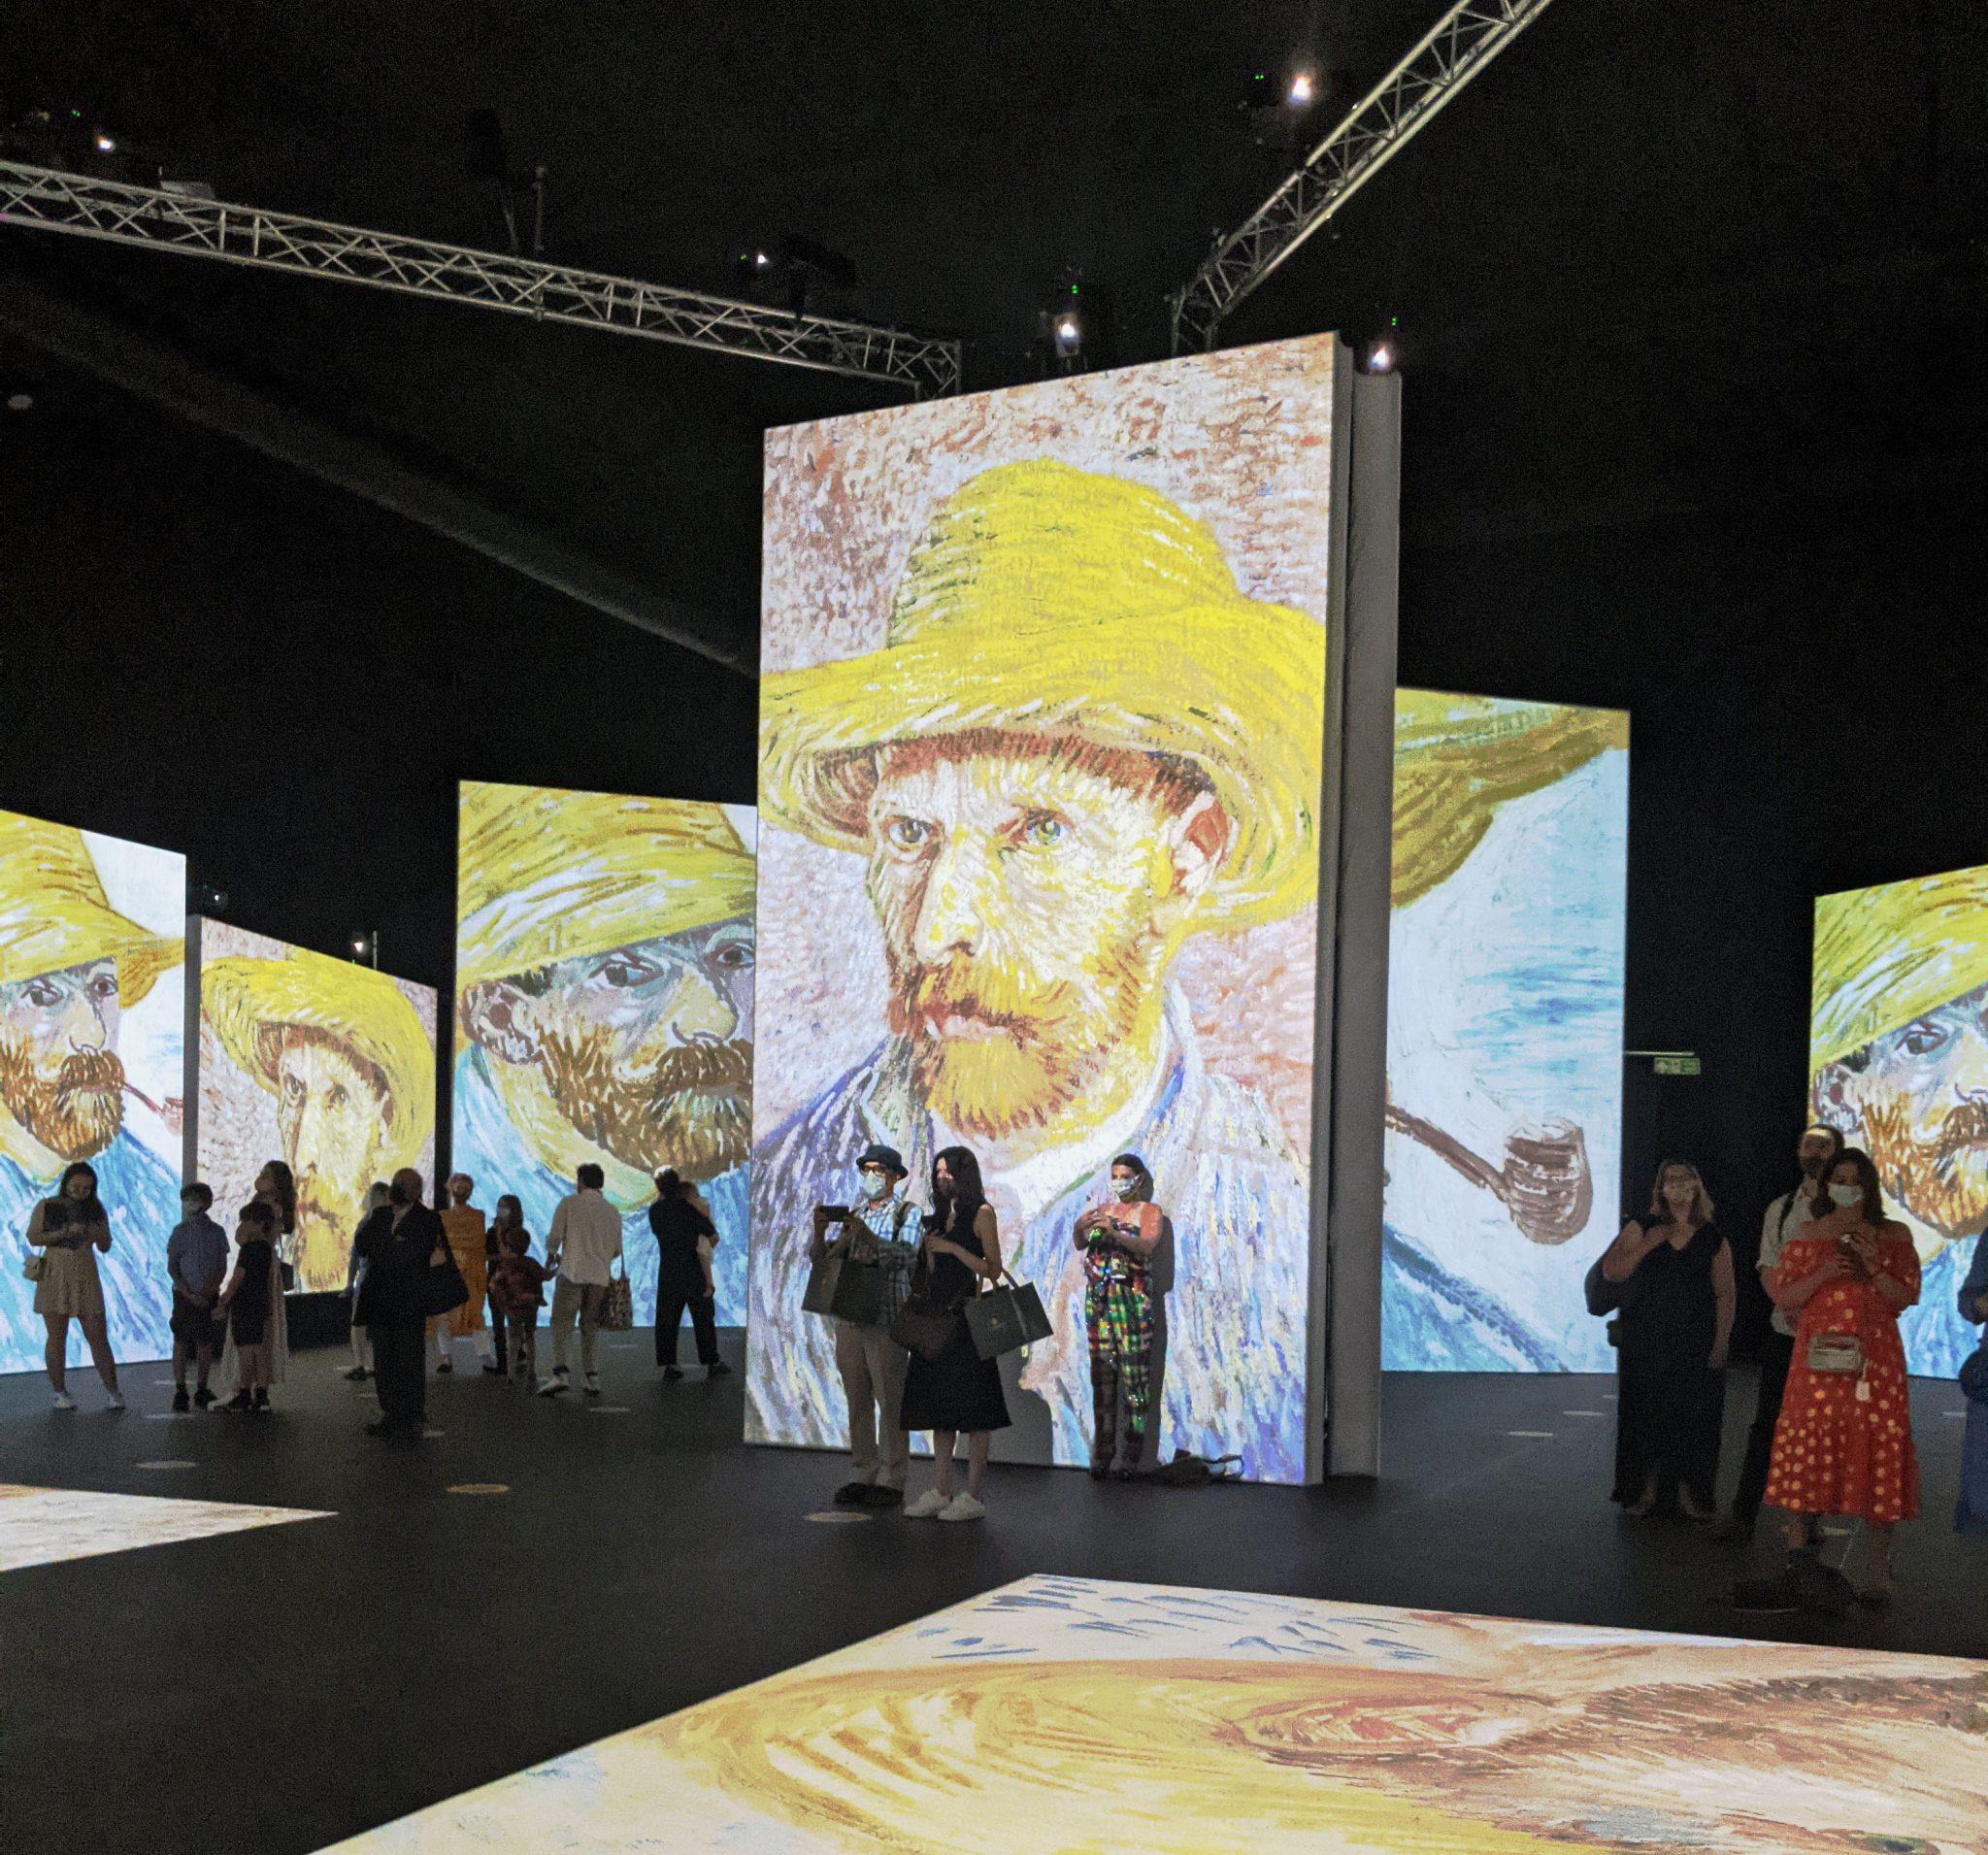 Visitors at Van Gogh alive